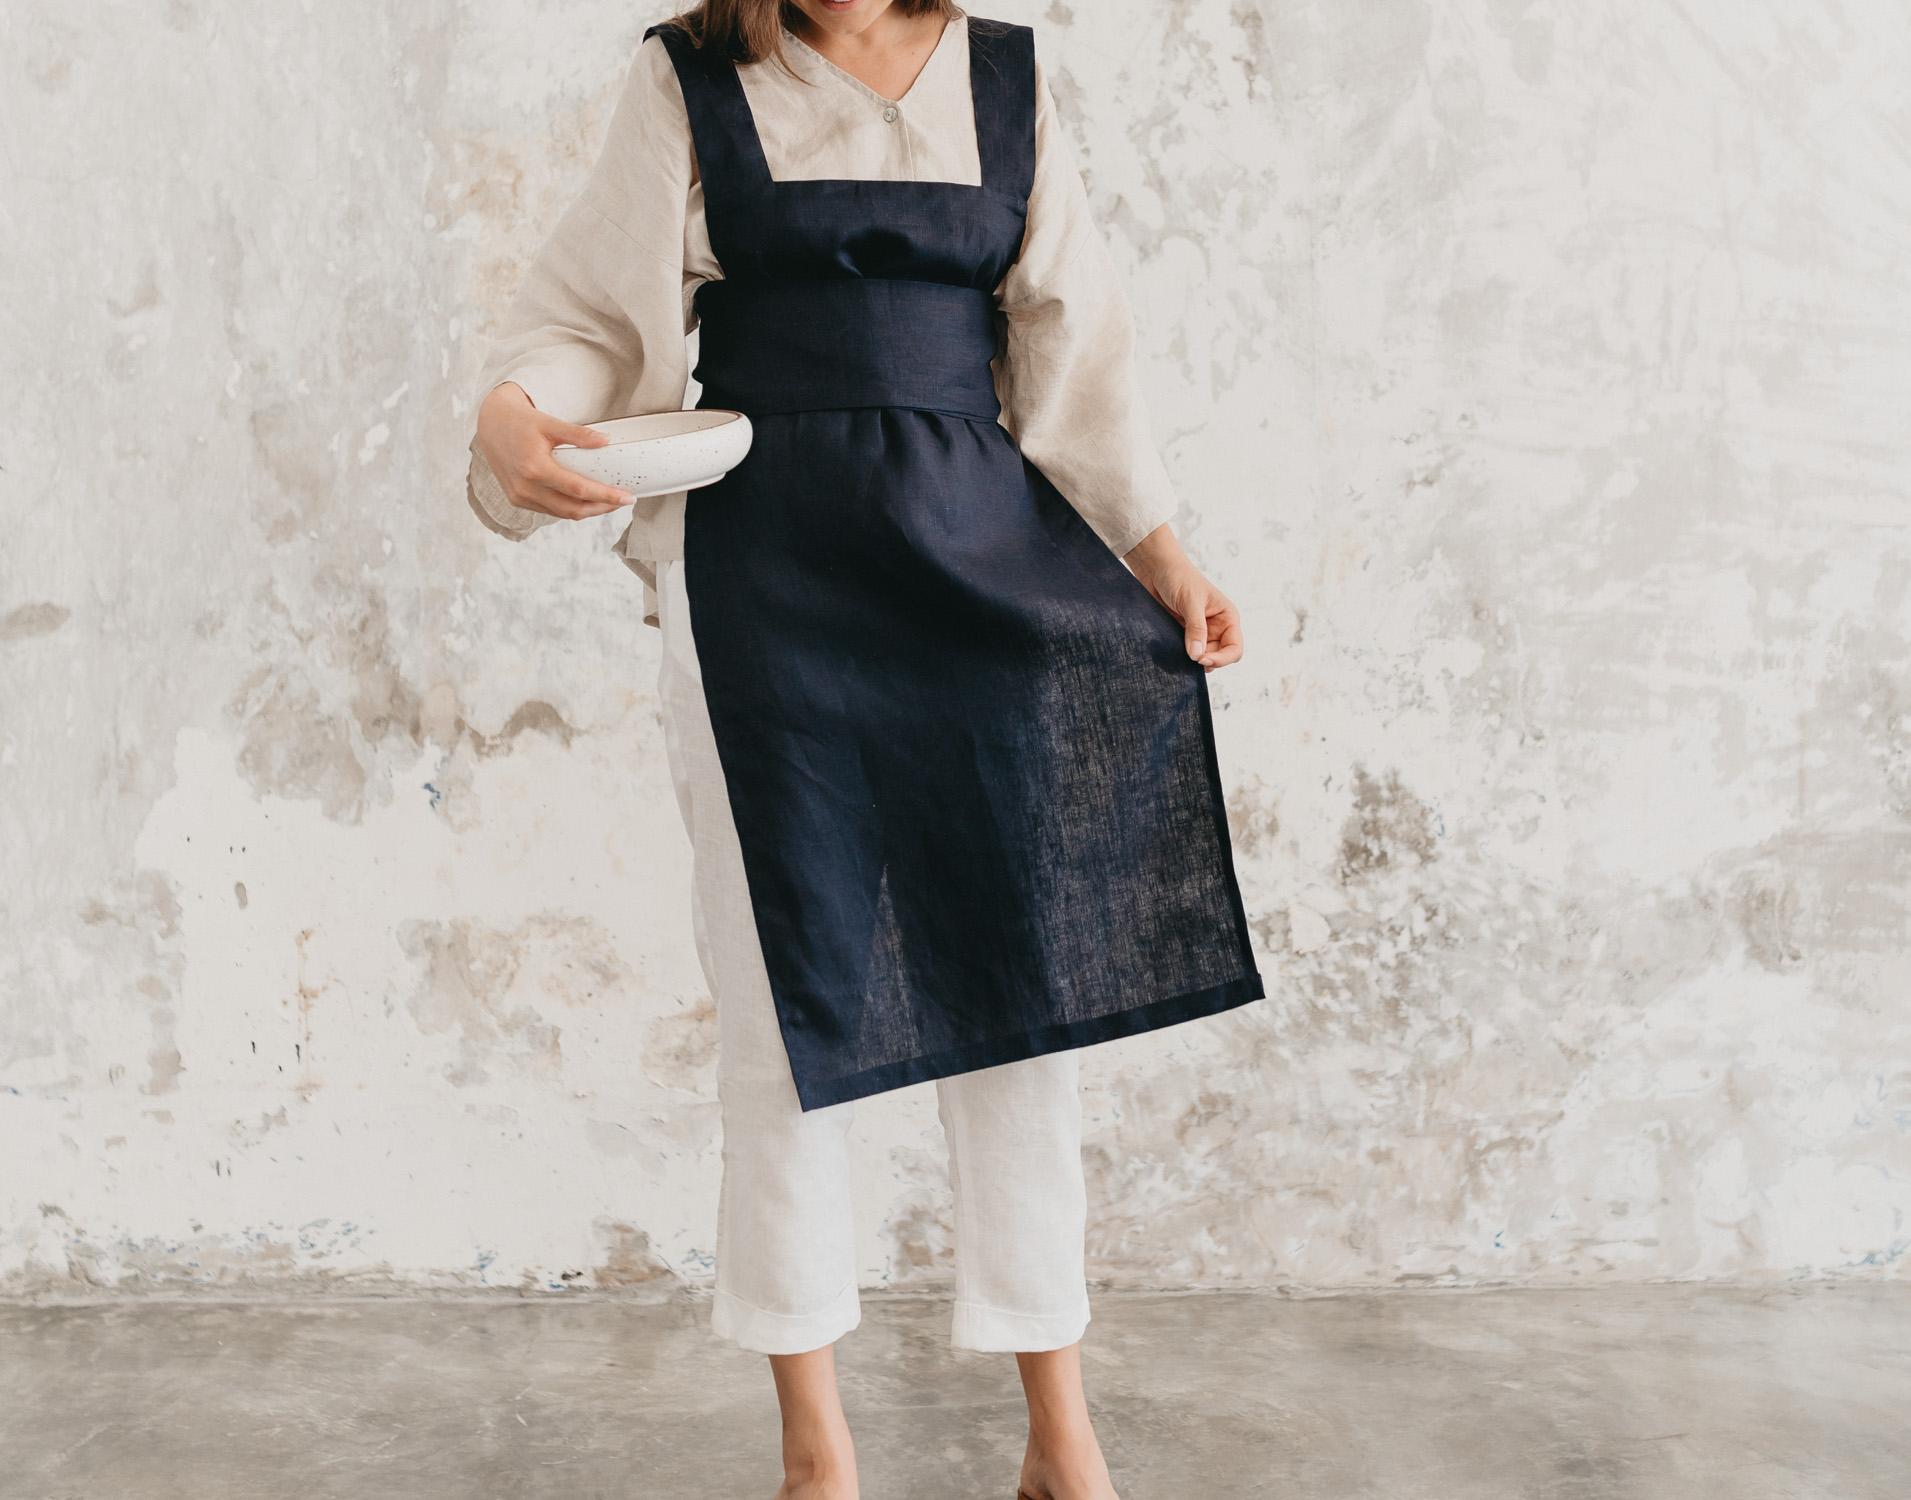 keira-mason-nowhere-and-everywhere-ethical-linen-apron.jpg